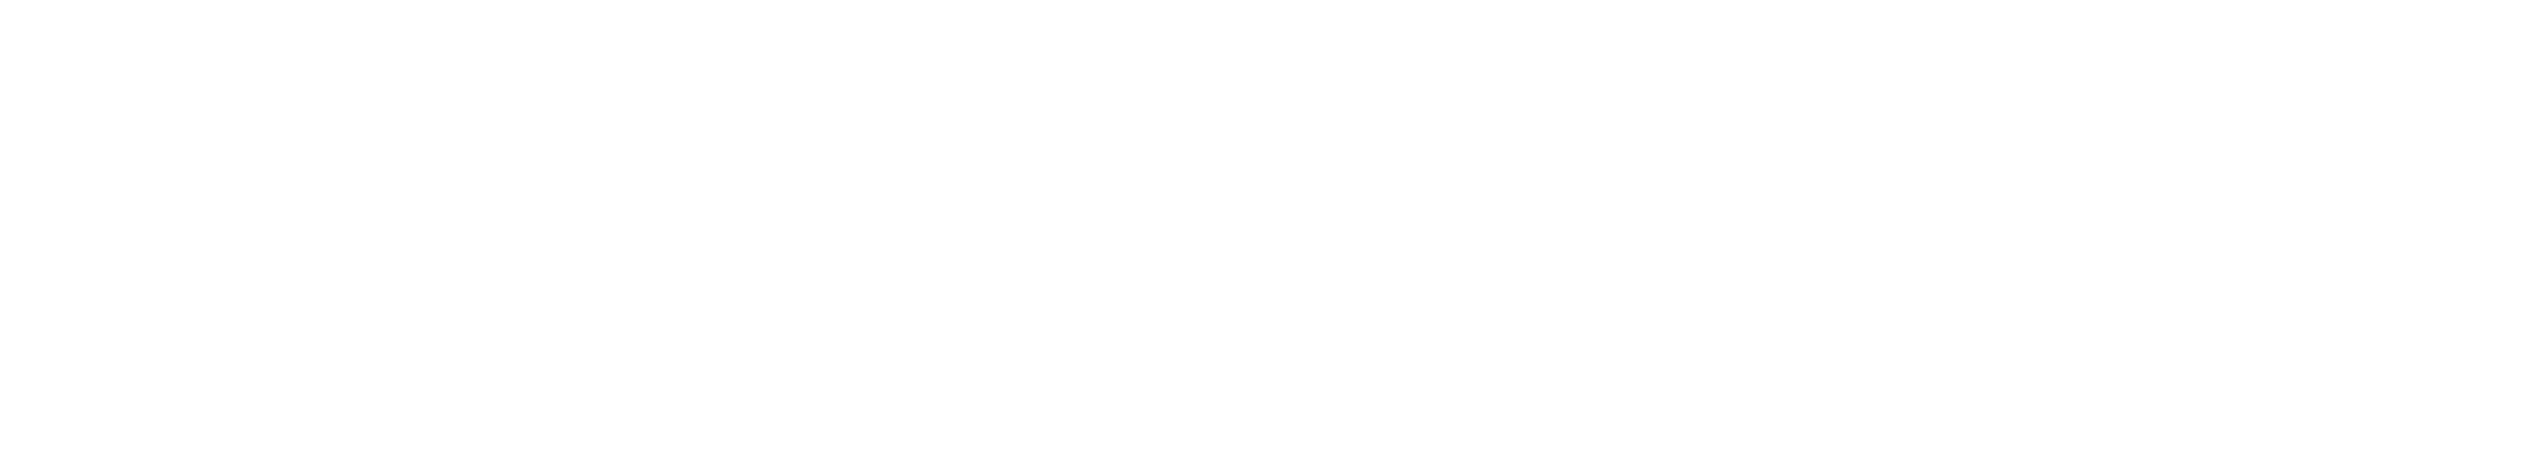 DigitalFoodLab